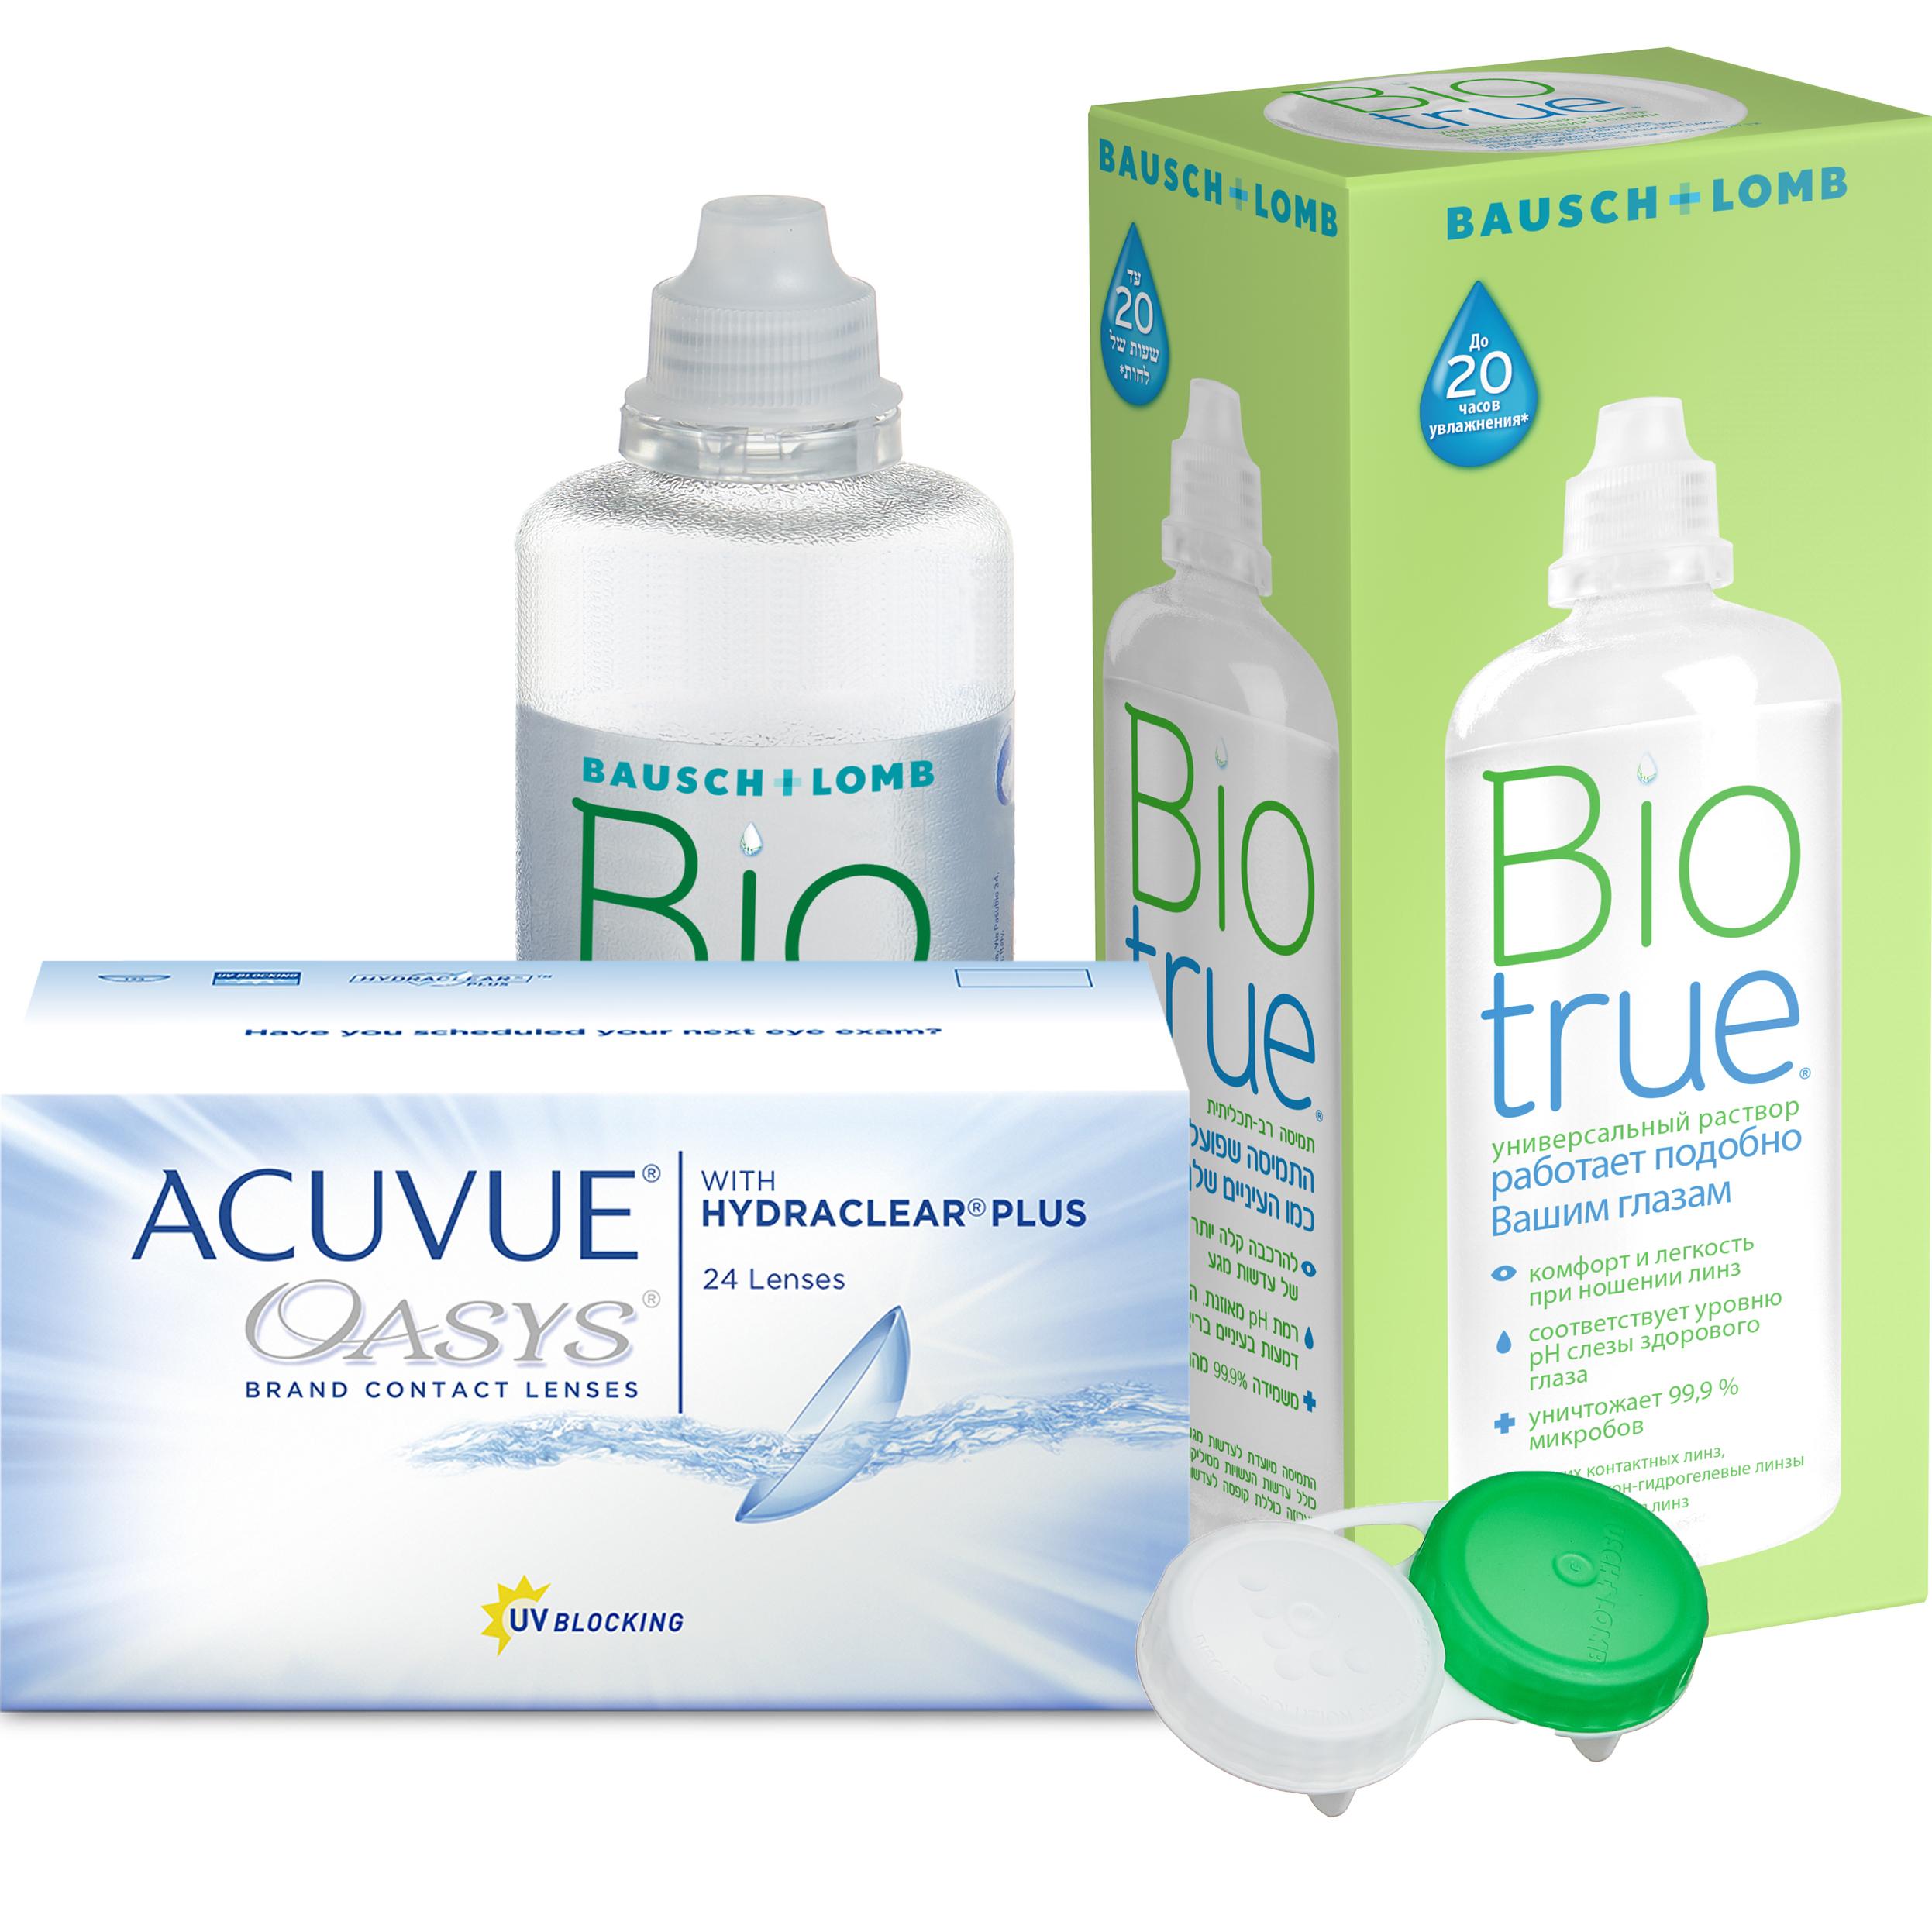 Купить Oasys with Hydraclear Plus 24 линзы + Biotrue, Контактные линзы Acuvue Oasys with Hydraclear Plus 24 линзы R 8.8 +1, 25 + Biotrue 300 мл